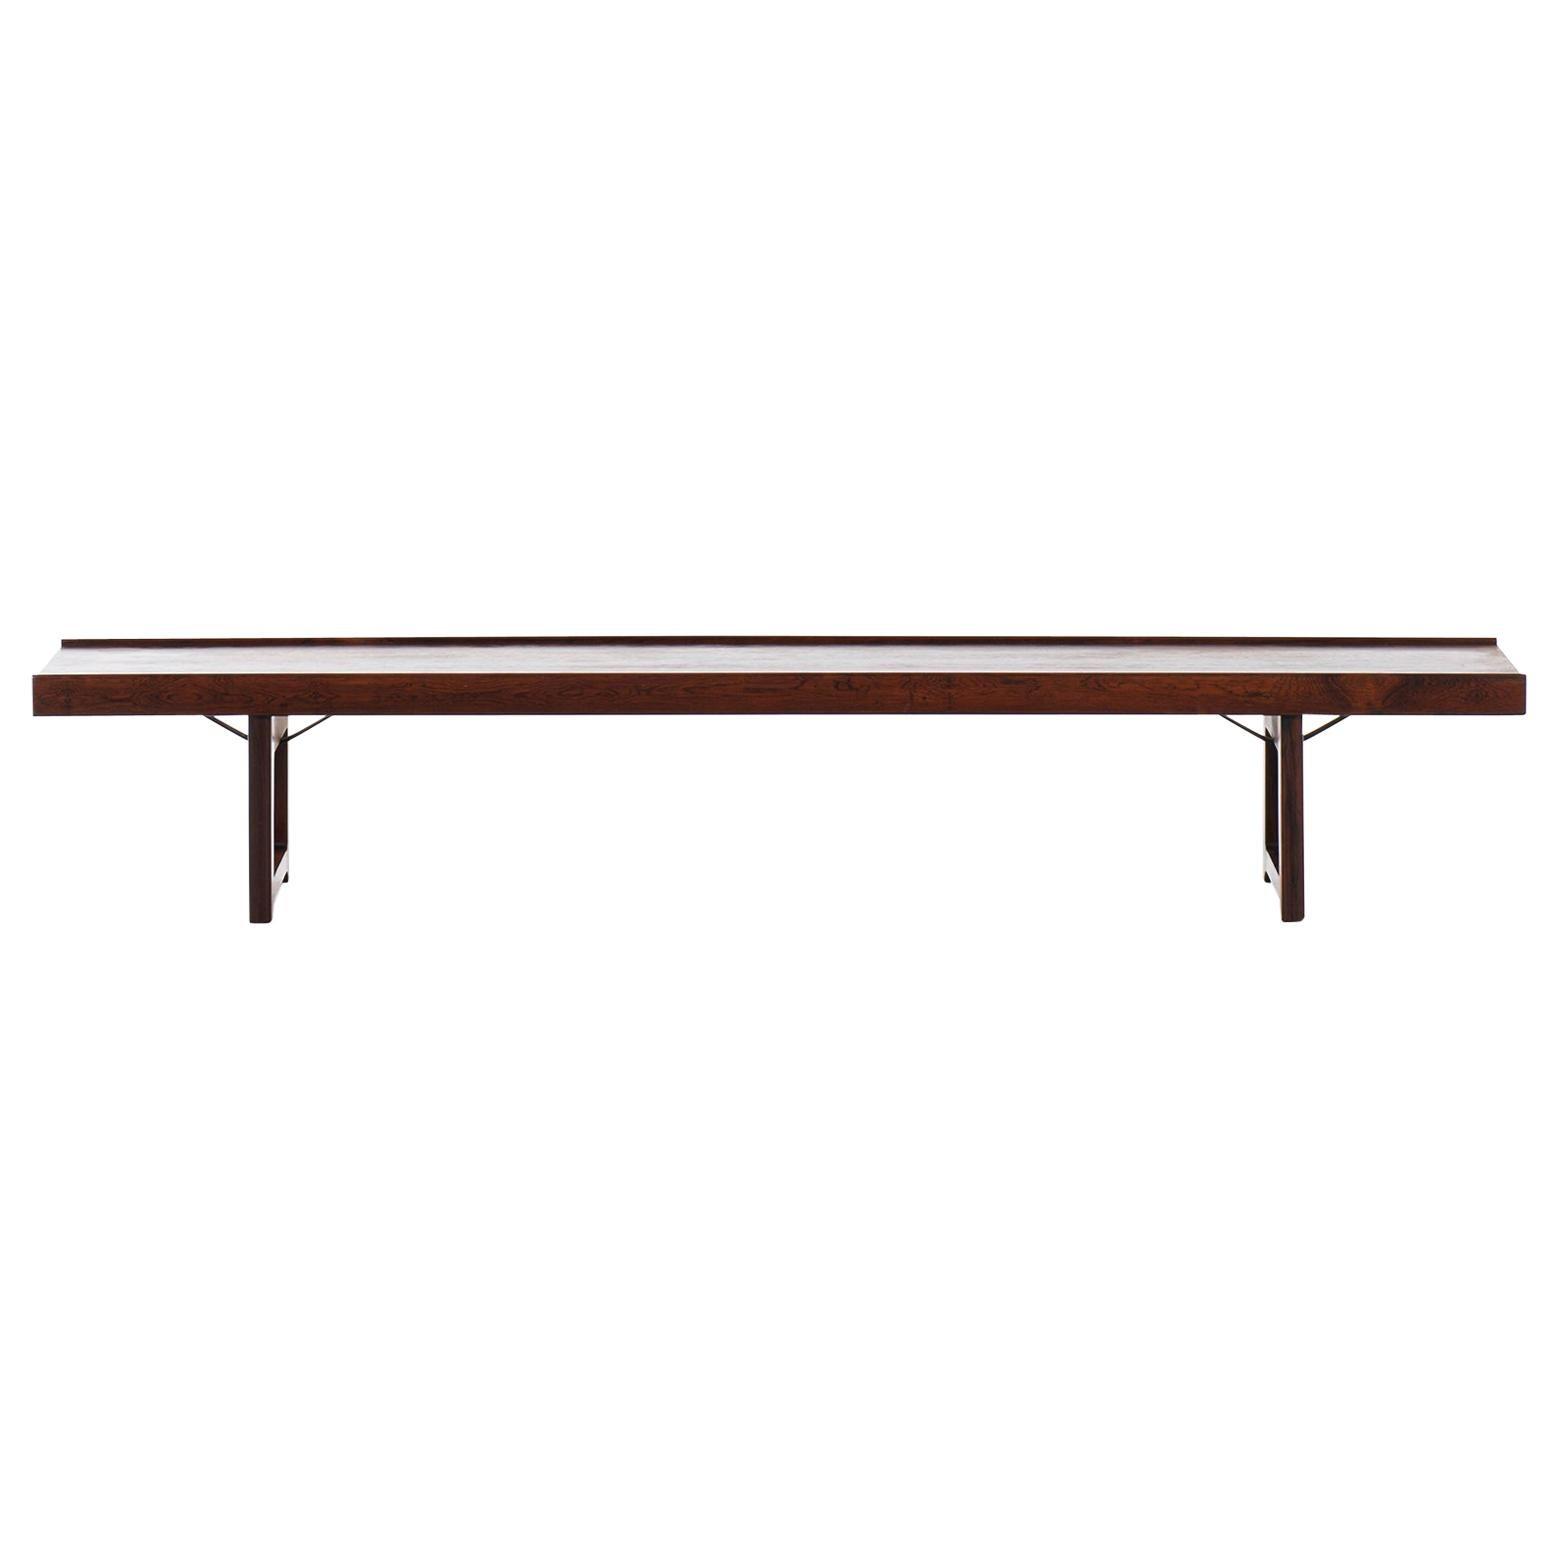 Torbjørn Afdal Bench / Side Table Model Krobo Produced in Norway